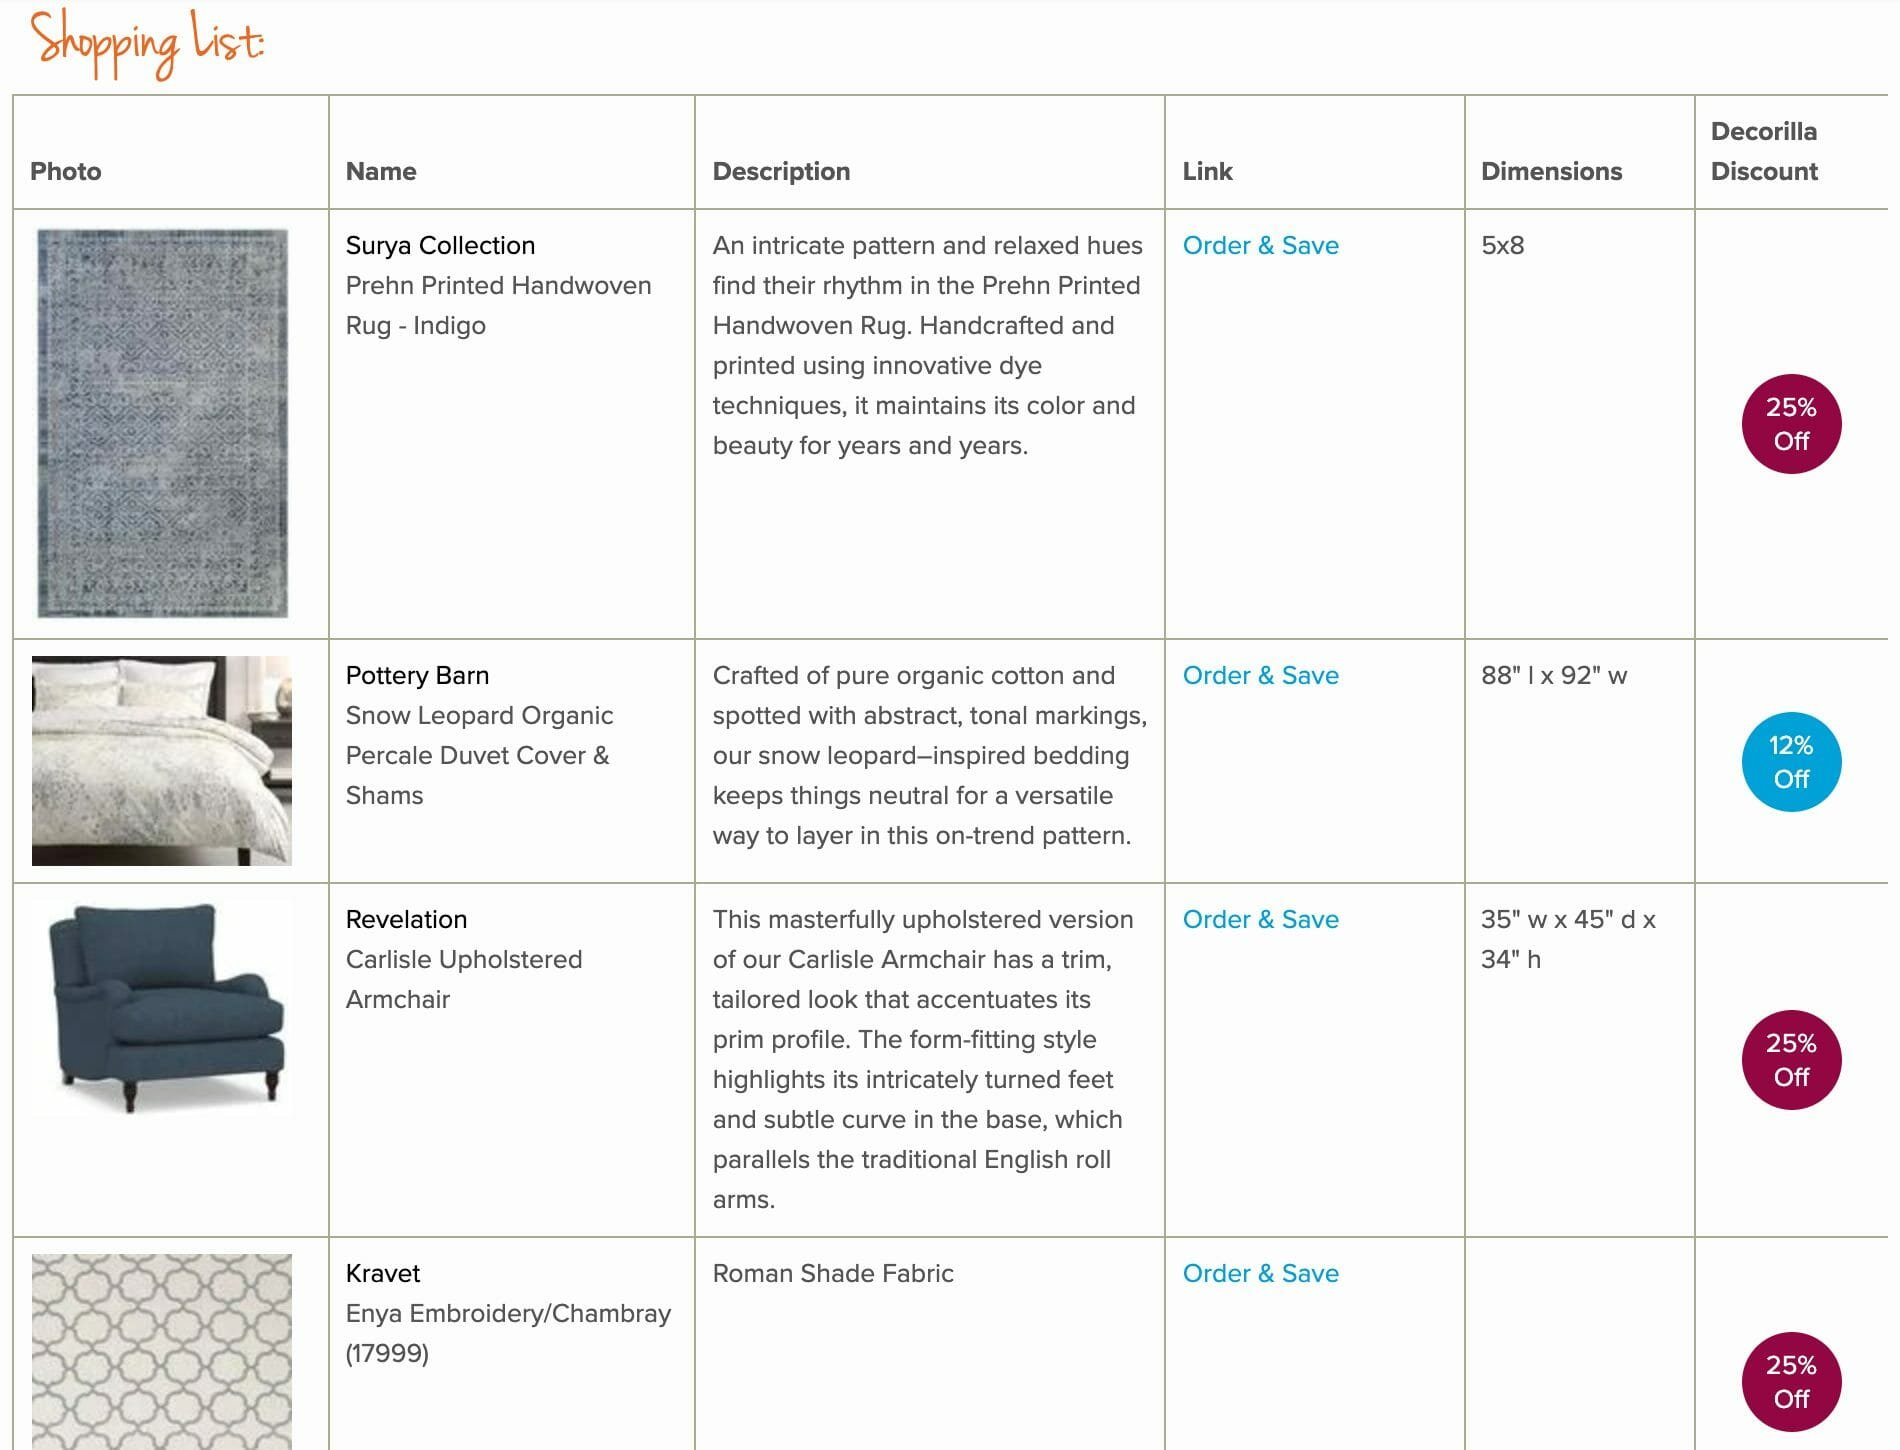 beach bedroom decor and furniture online interior design shopping list